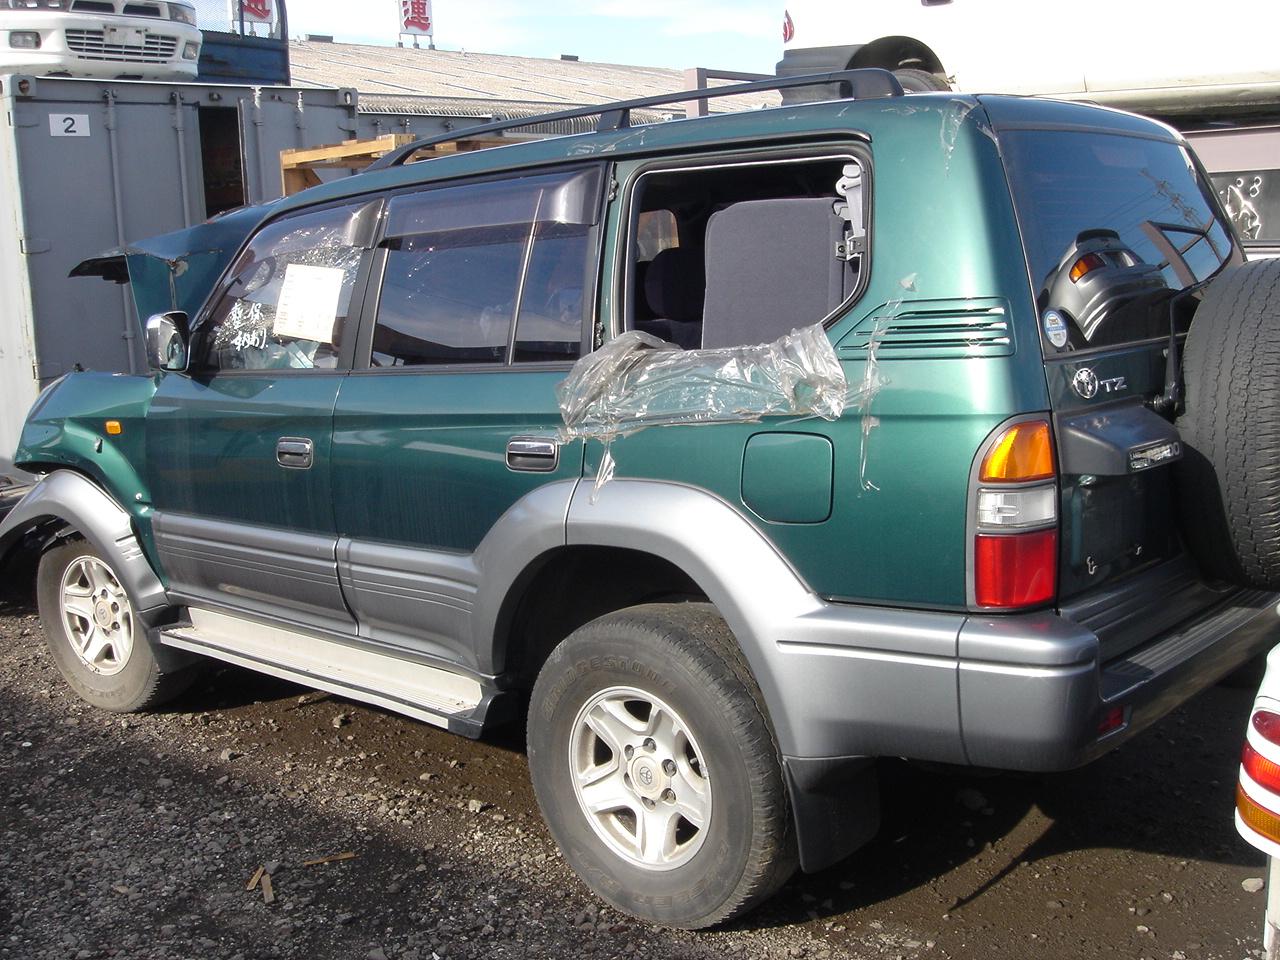 Toyota Land Cruiser Prado Tz 1996 Damaged For Sale